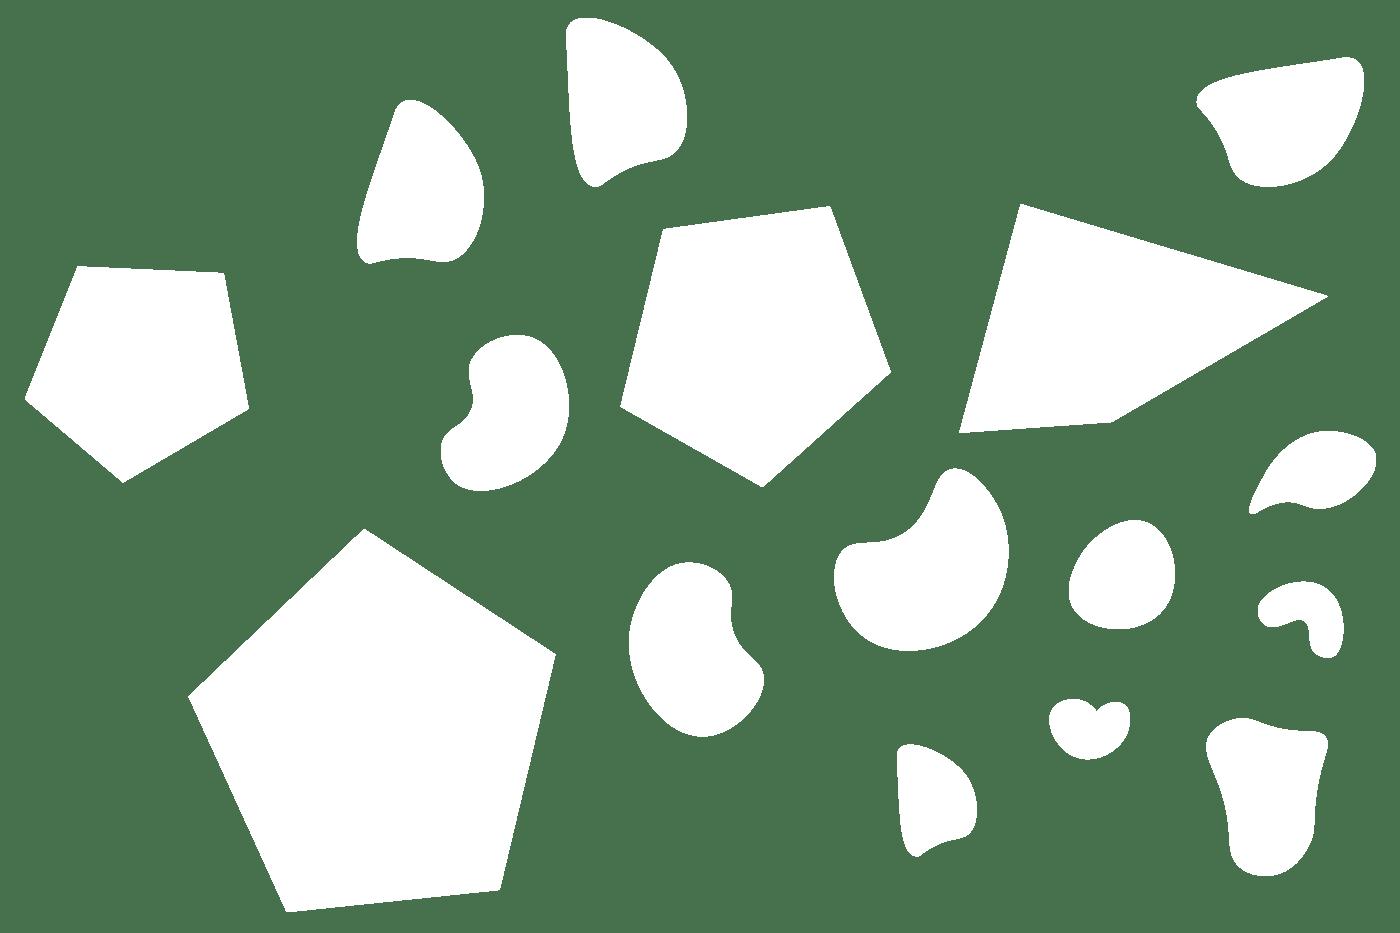 pattern_white